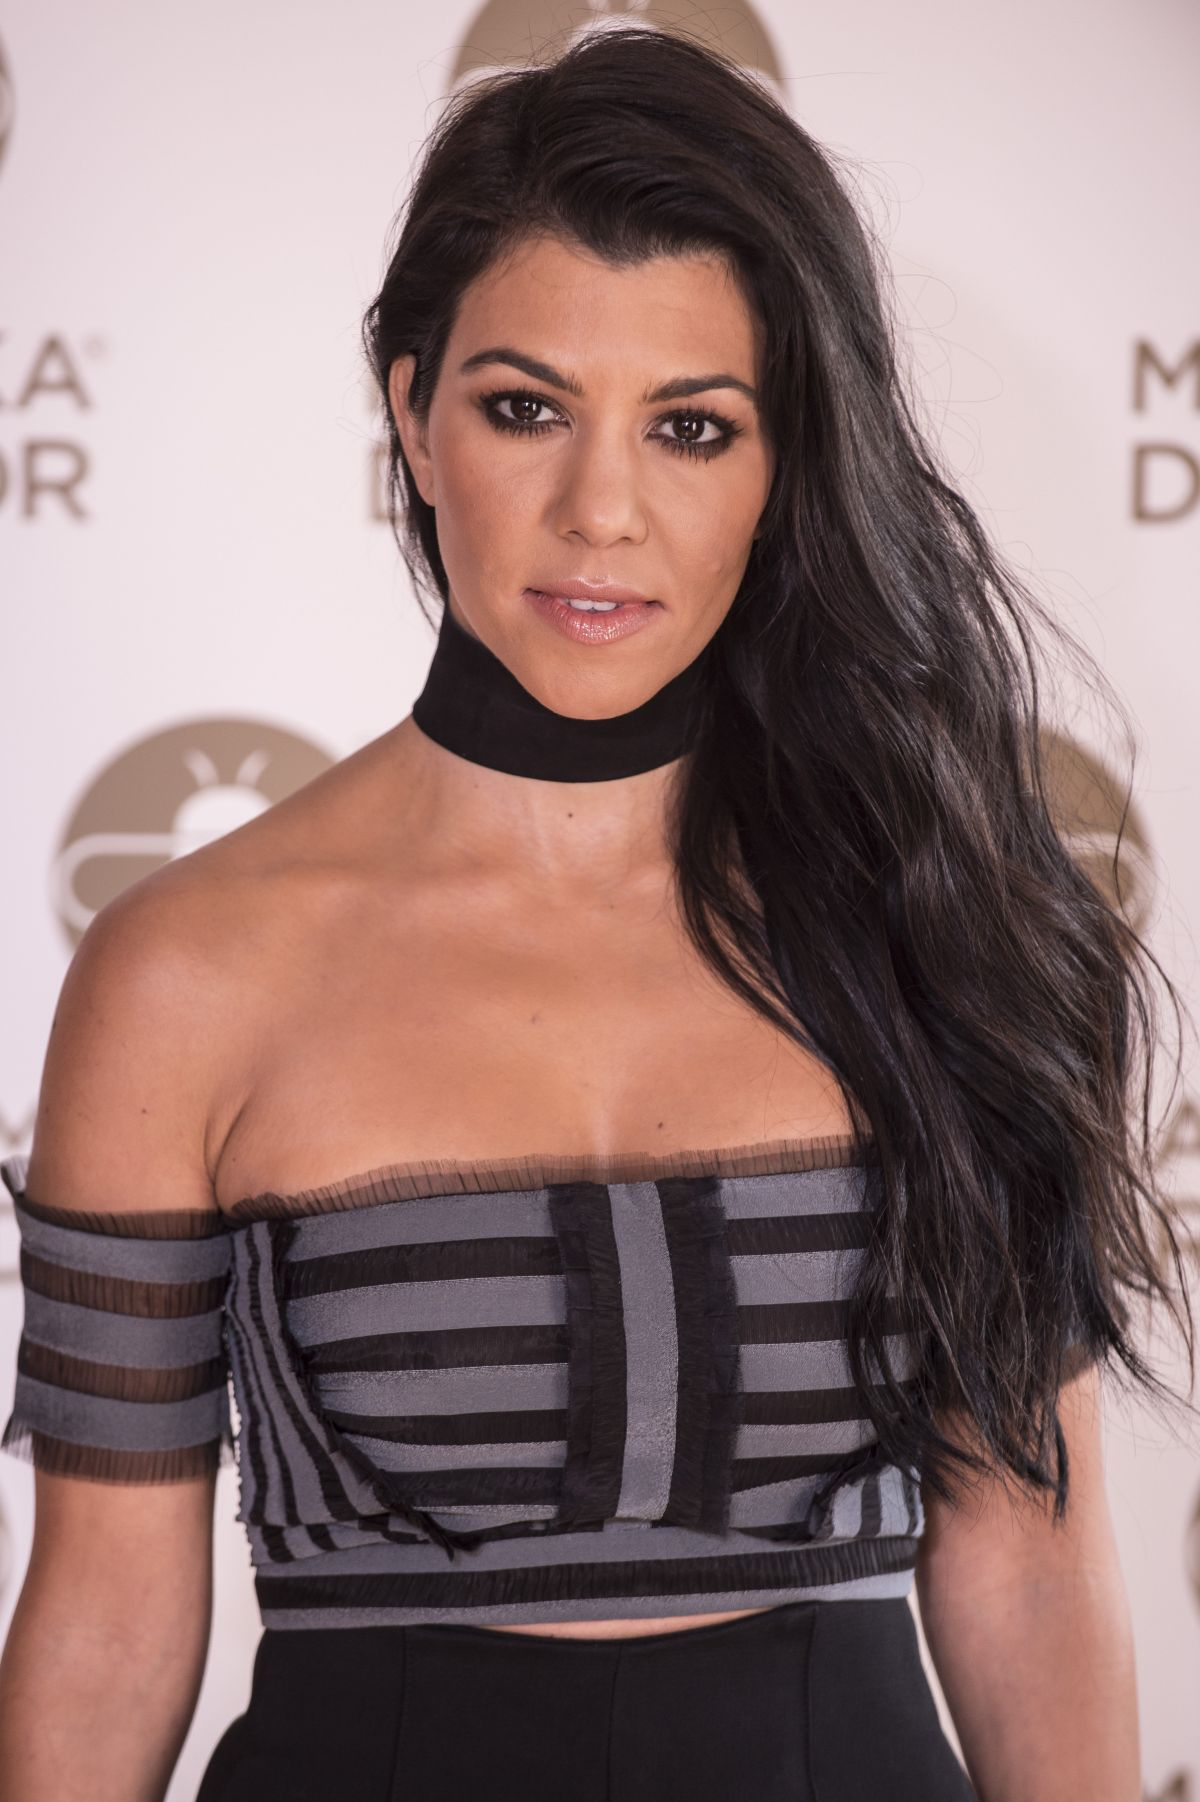 Kourtney Kardashian Unfollows Boyfriend and Deletes